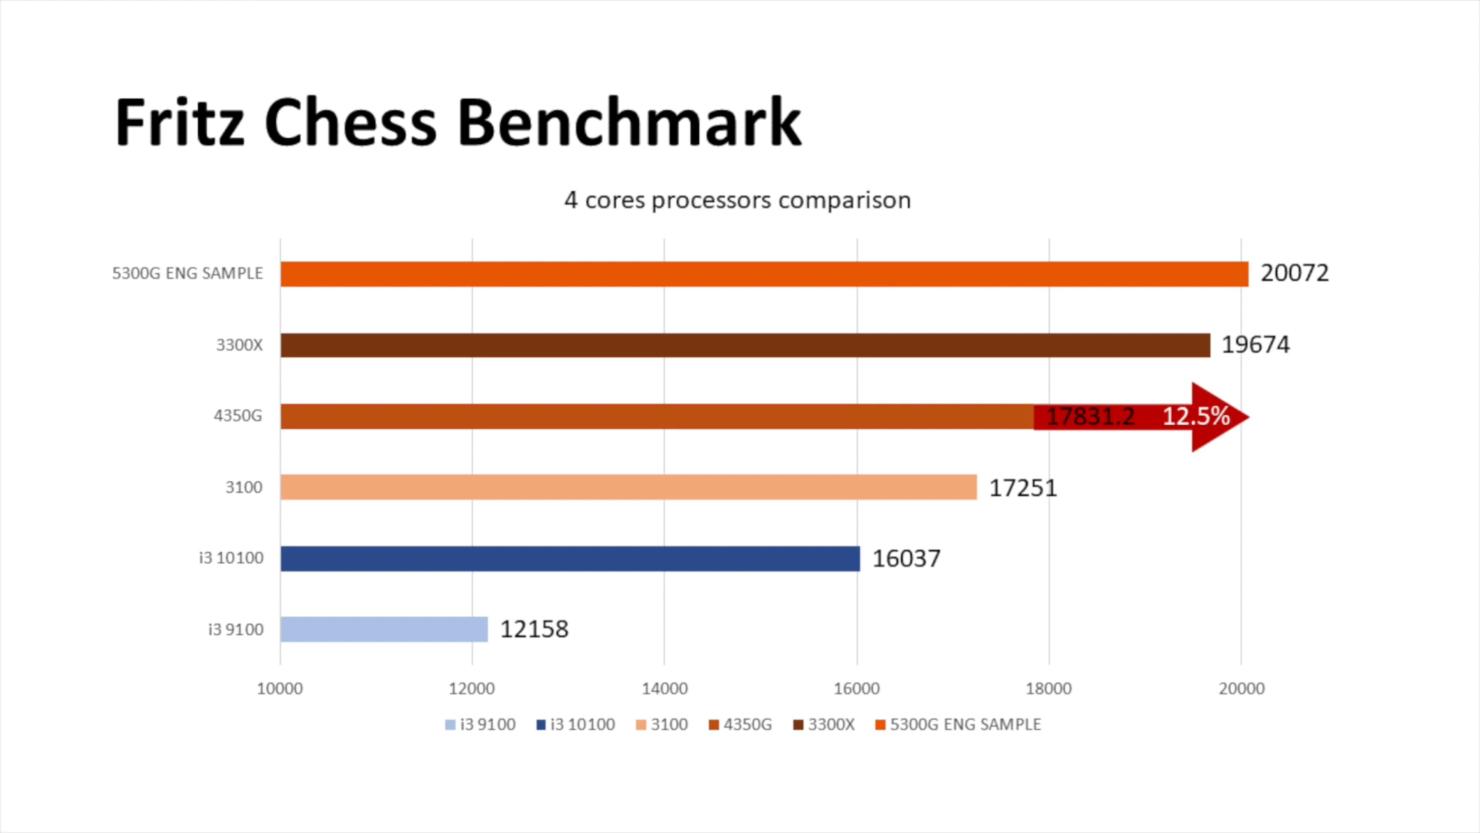 amd-ryzen-5-5300g-4-core-zen-3-desktop-apu-_-benchmarks-_3